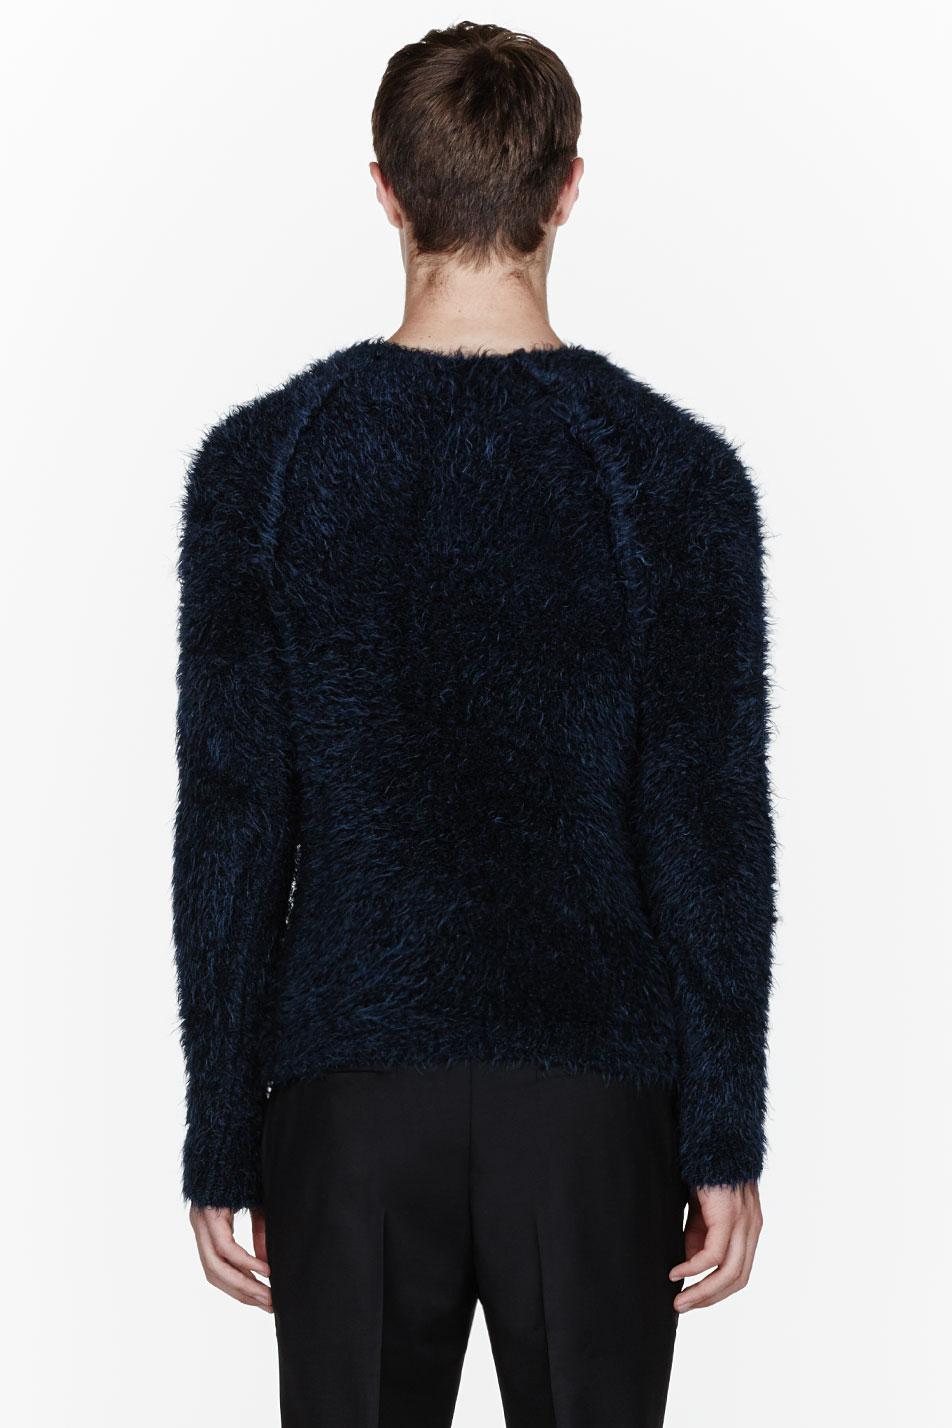 Paul Smith Navy Blue Mohair Sweater In Black For Men Lyst